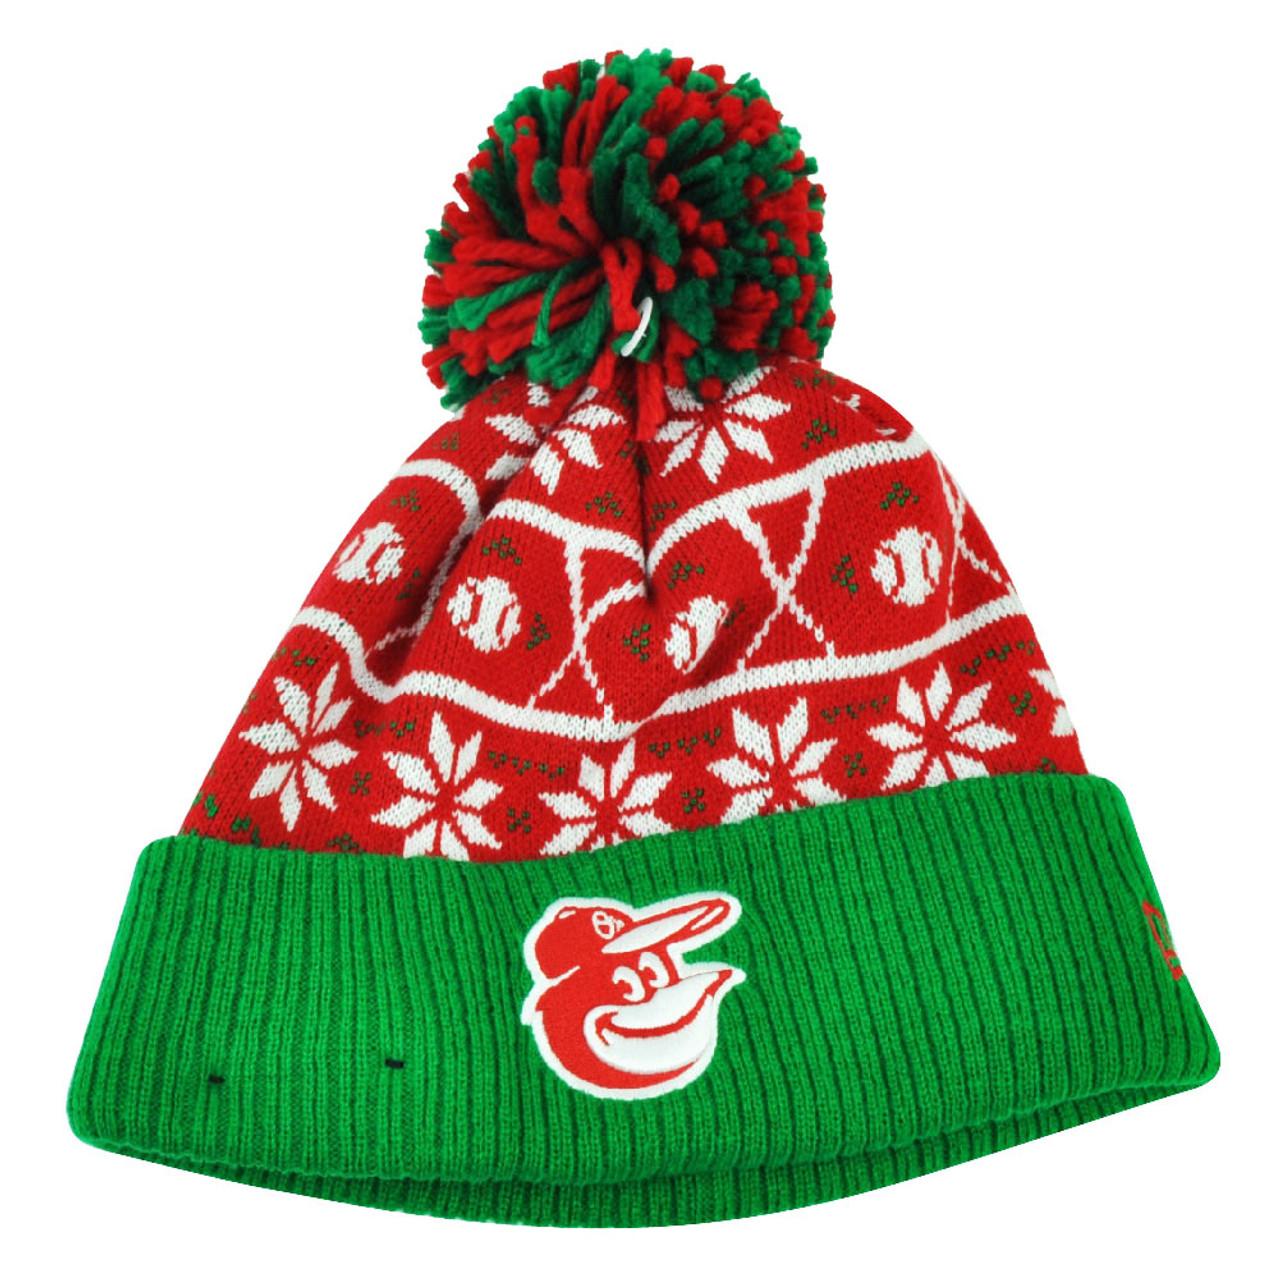 2f1f9fd2 MLB New Era Sweater Chill Baltimore Orioles Pom Pom Cuffed Knit Beanie  Winter